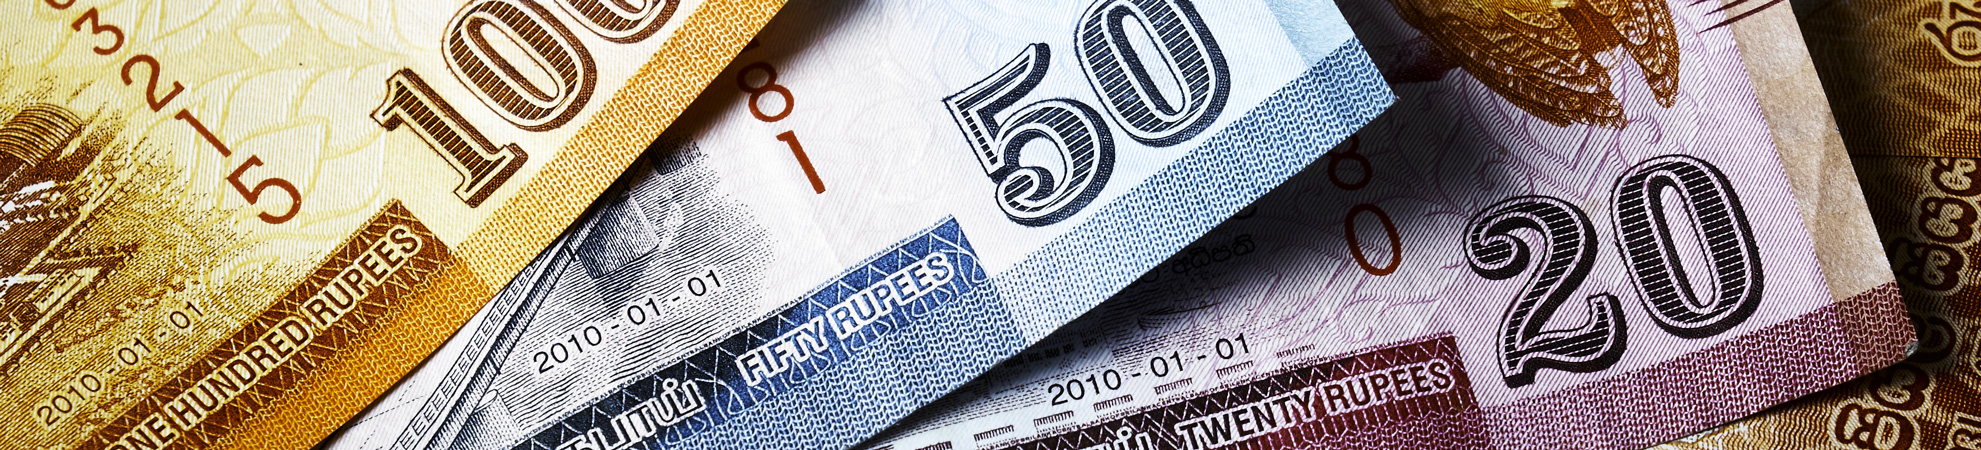 Monnaie au Sri Lanka